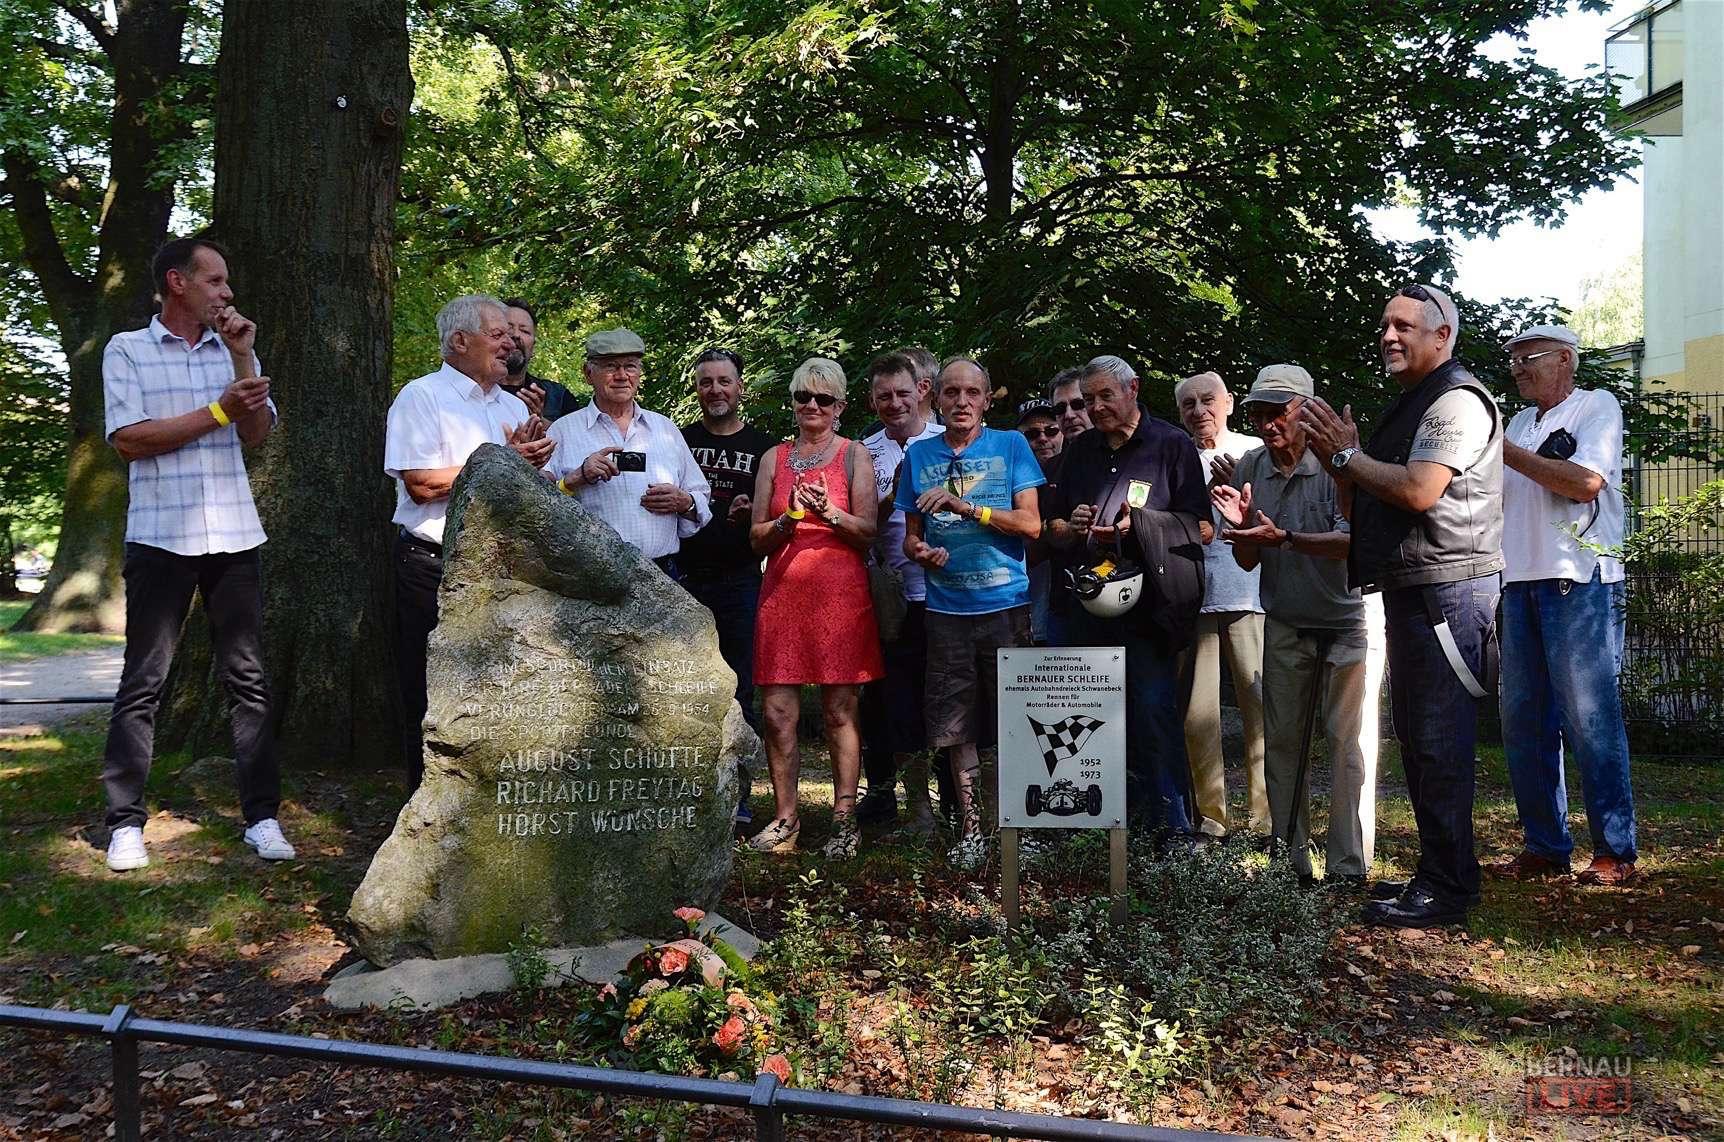 Road House Bernau: Gedenken an die Bernauer Schleife